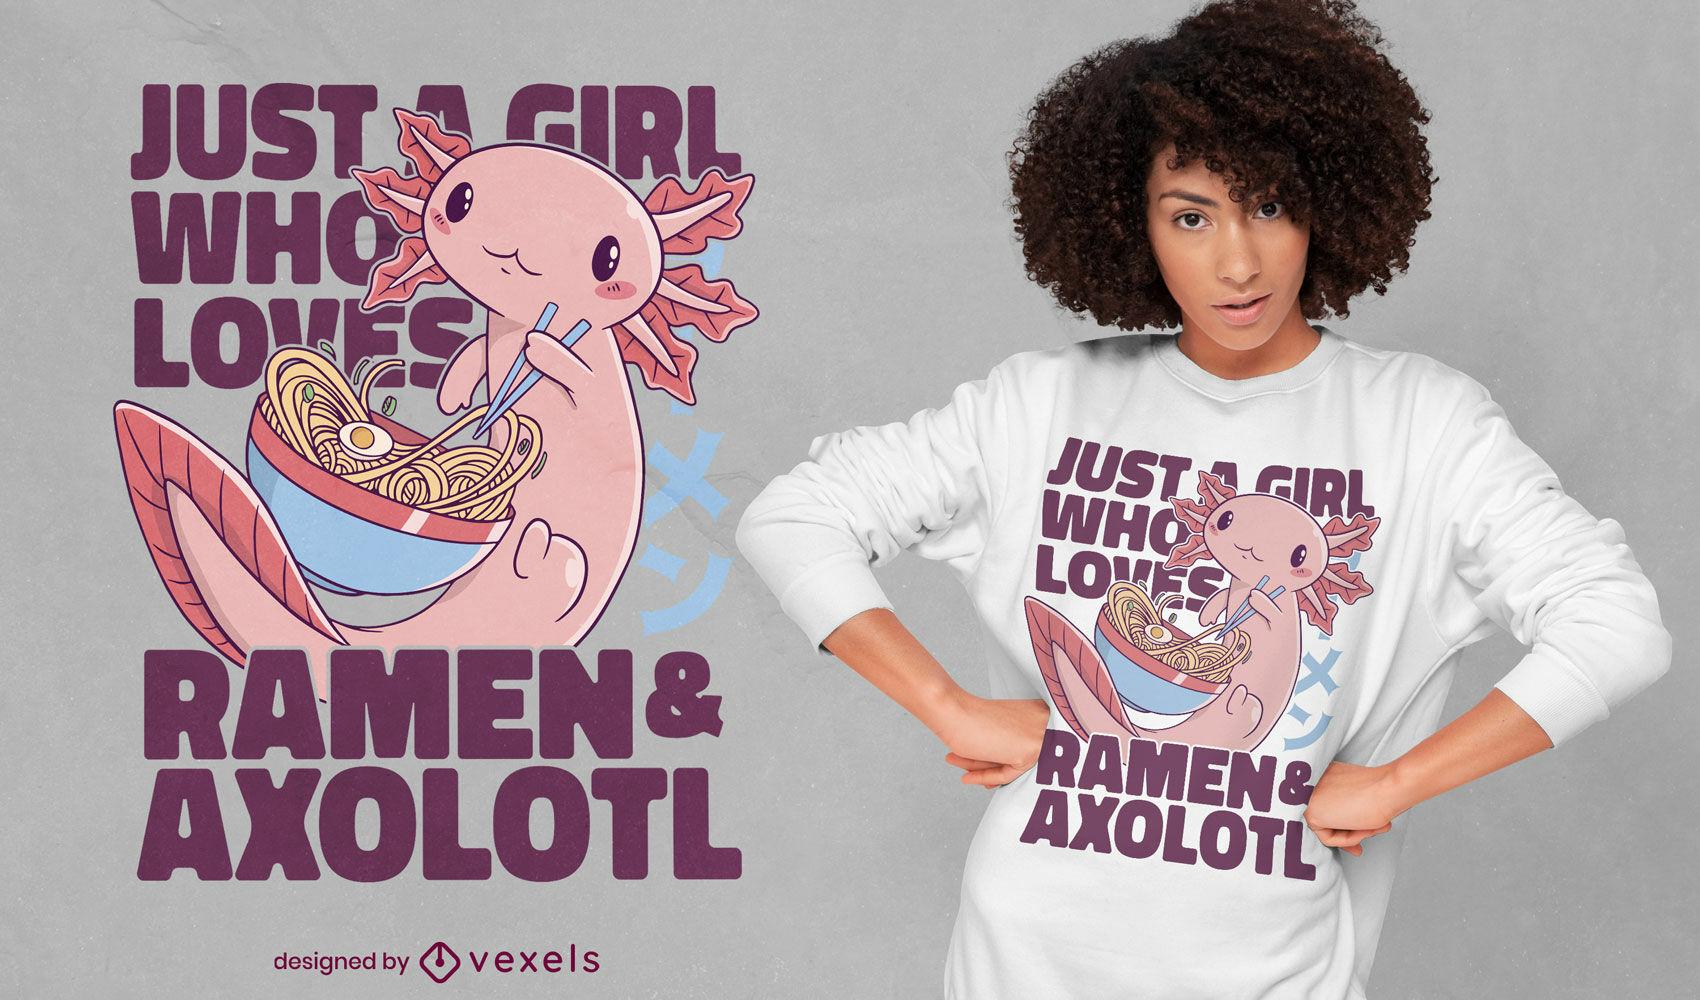 Girl who loves axolotls and ramen t-shirt design